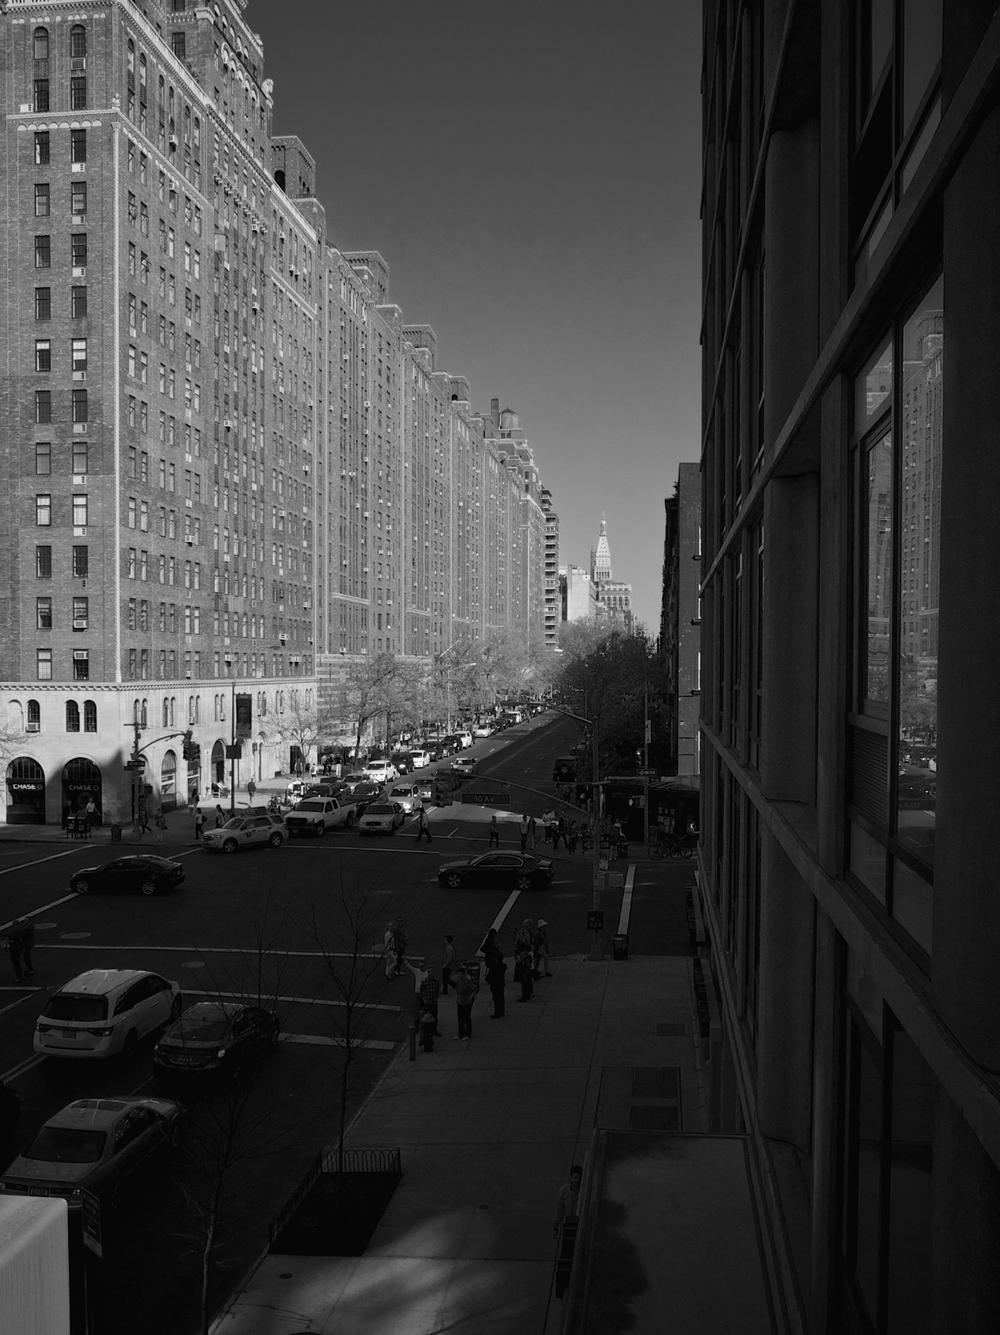 NYC BW 23.jpg